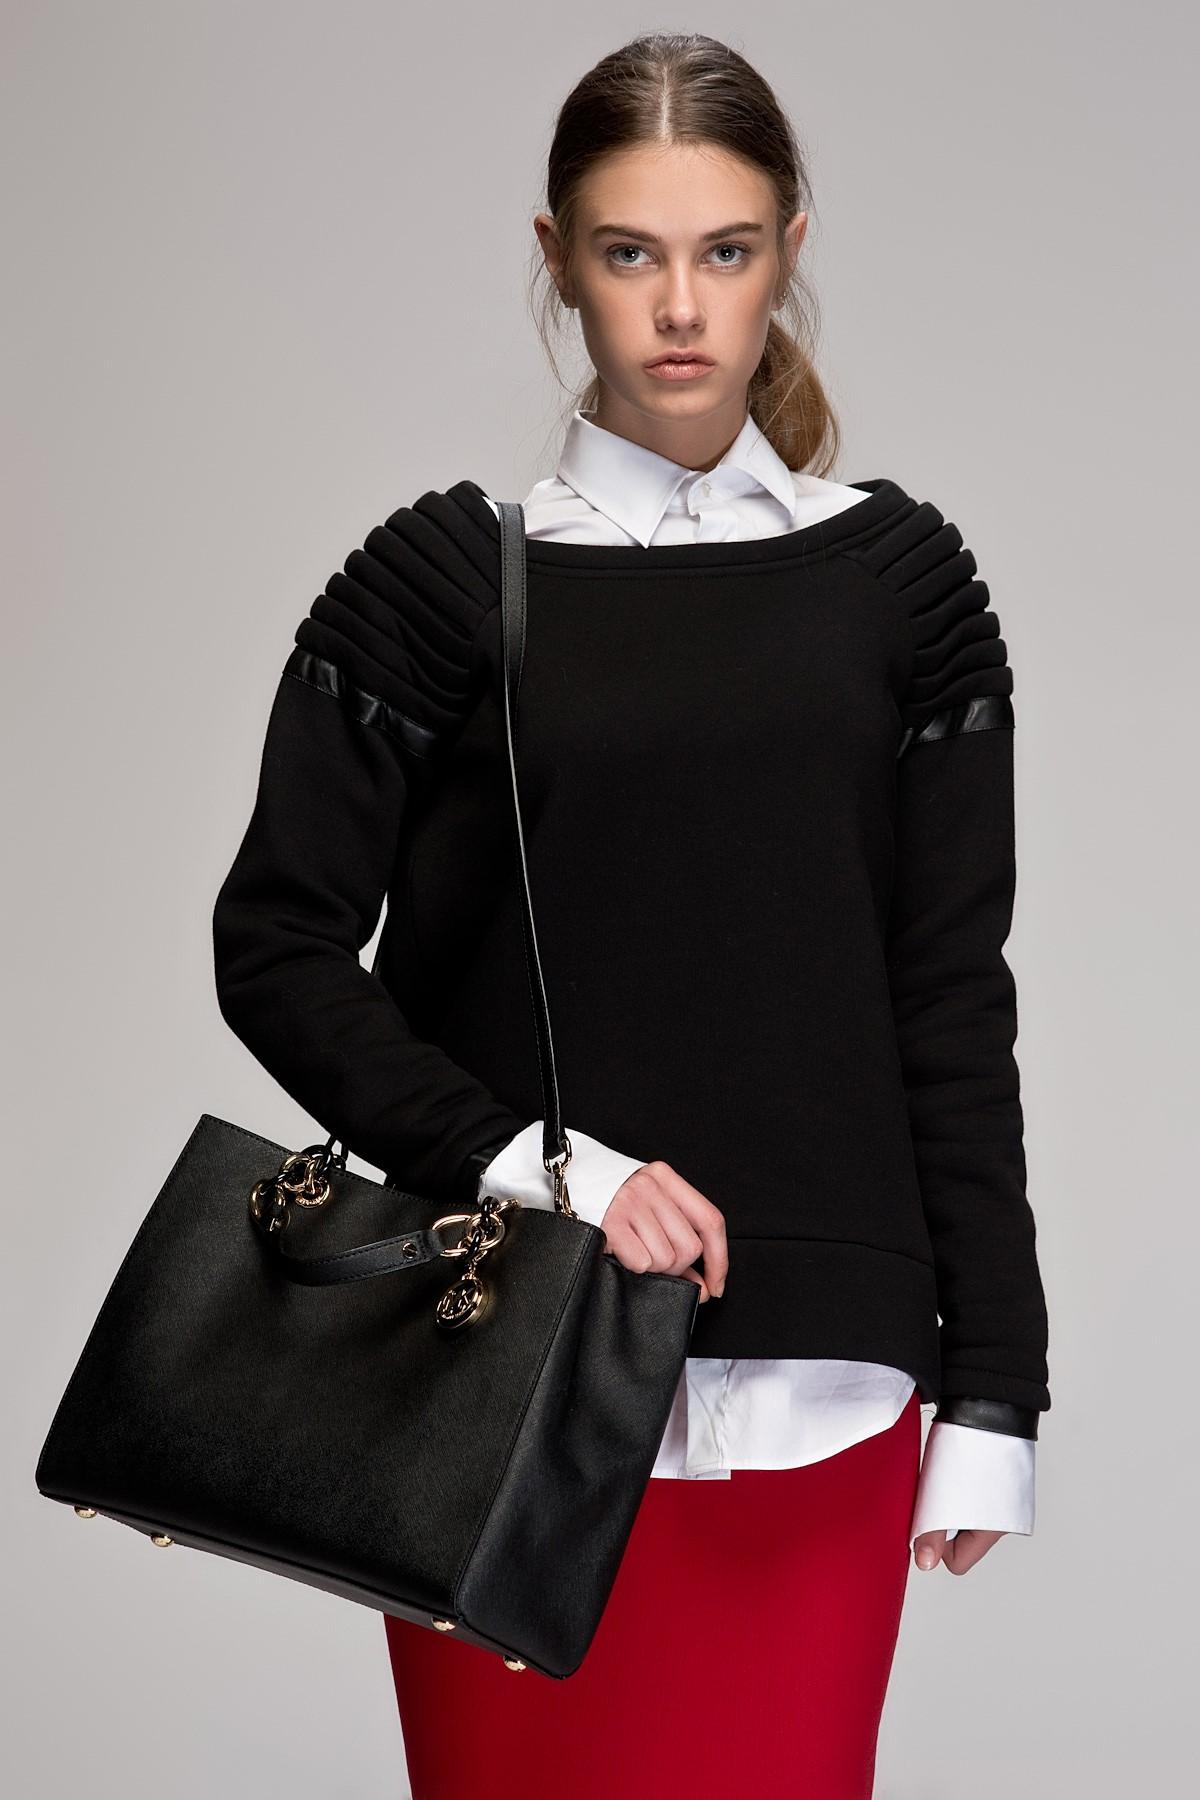 Siyah Michael Kors Çanta Modelleri